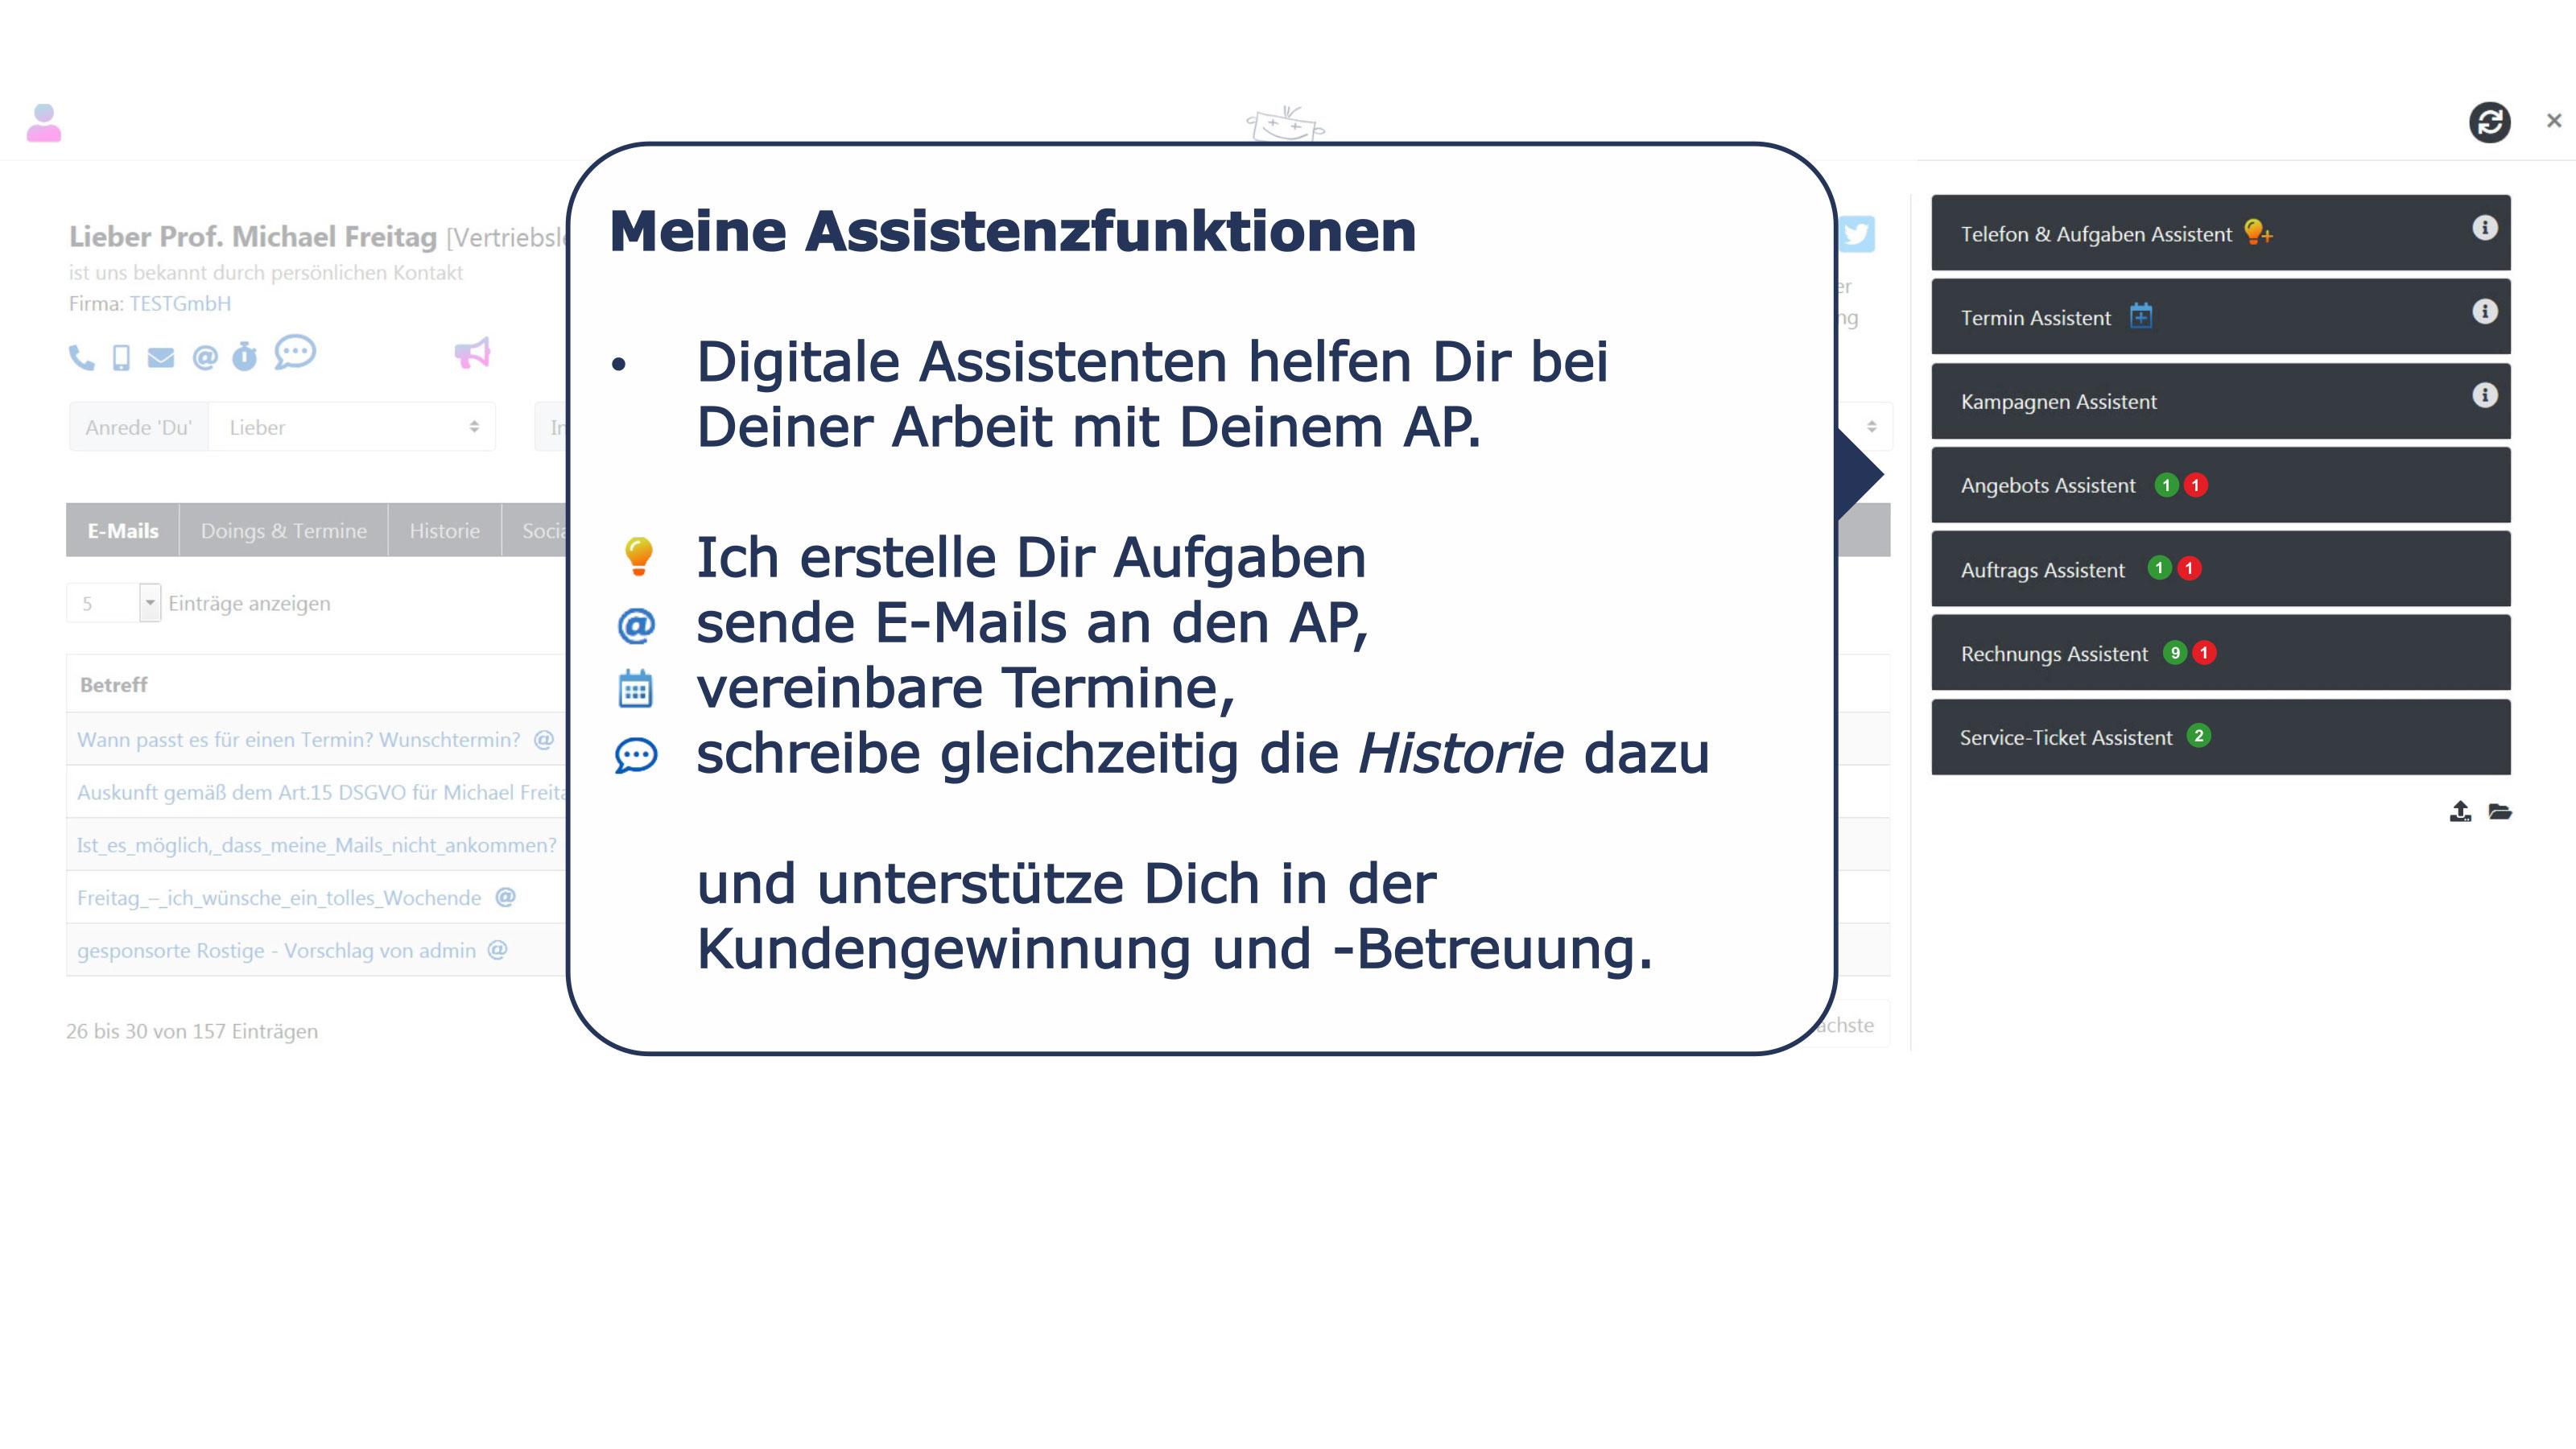 Ansprechpartner Detail Assistenzfunktionen